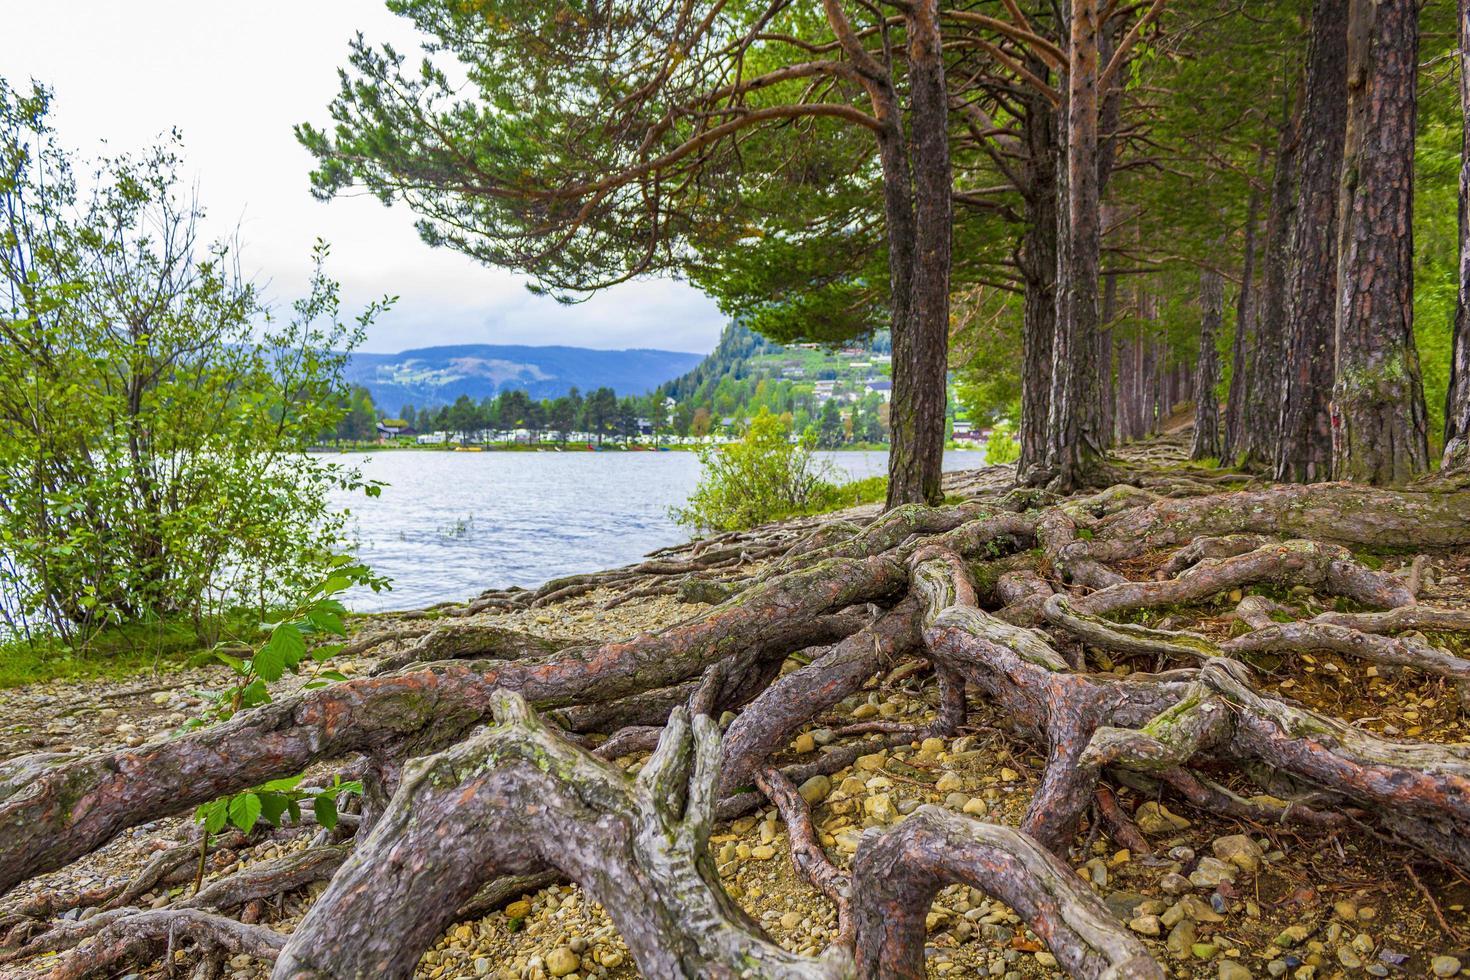 D'énormes racines d'arbres peu profonds de pins l'île de Fagernes en Norvège photo